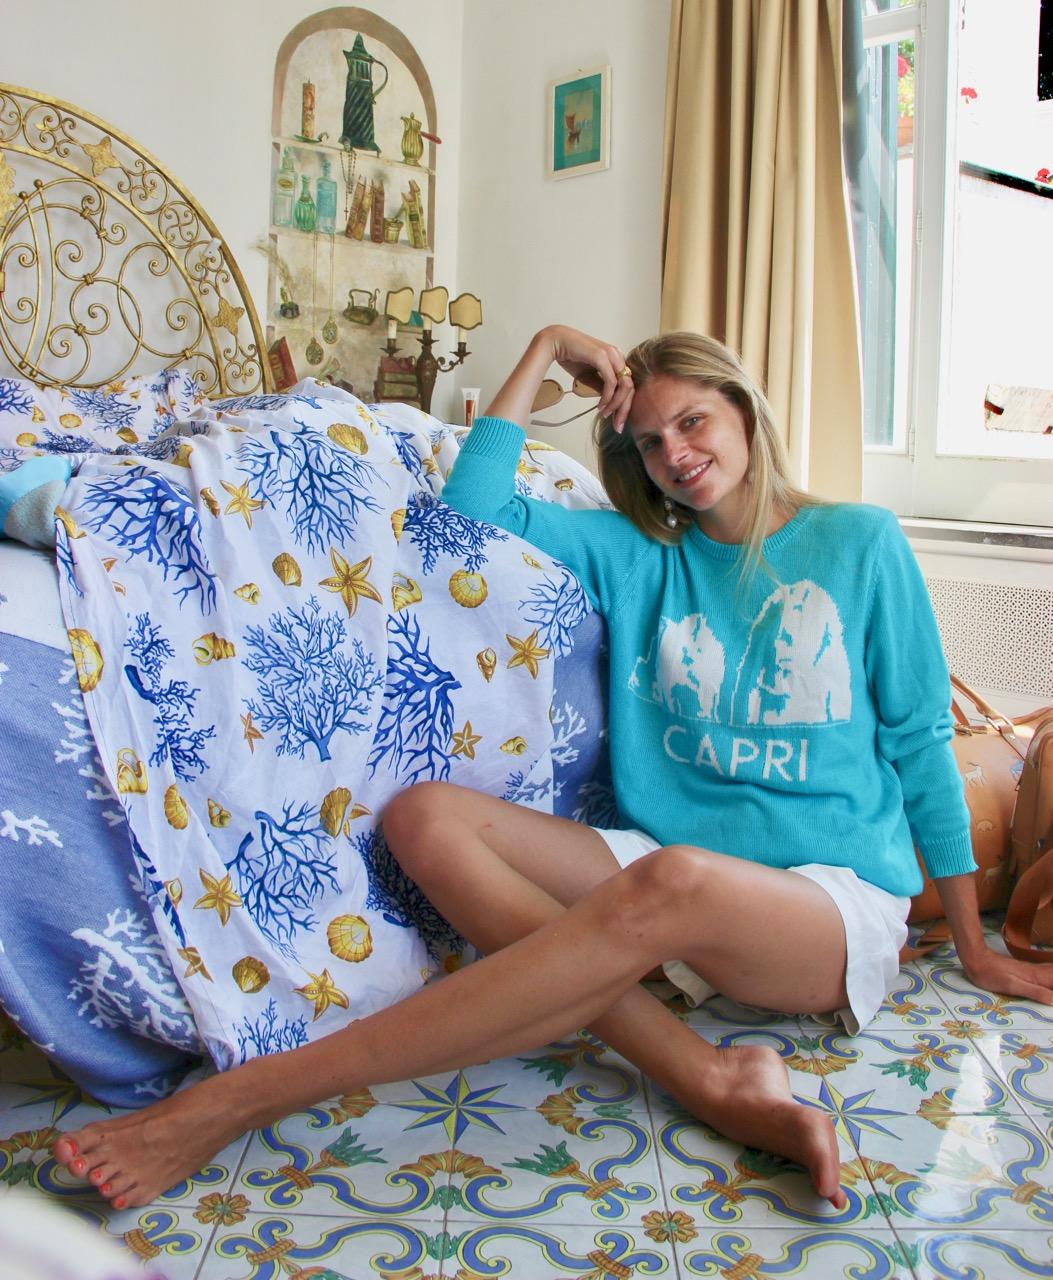 Capri Sweater Linea Leggera 2